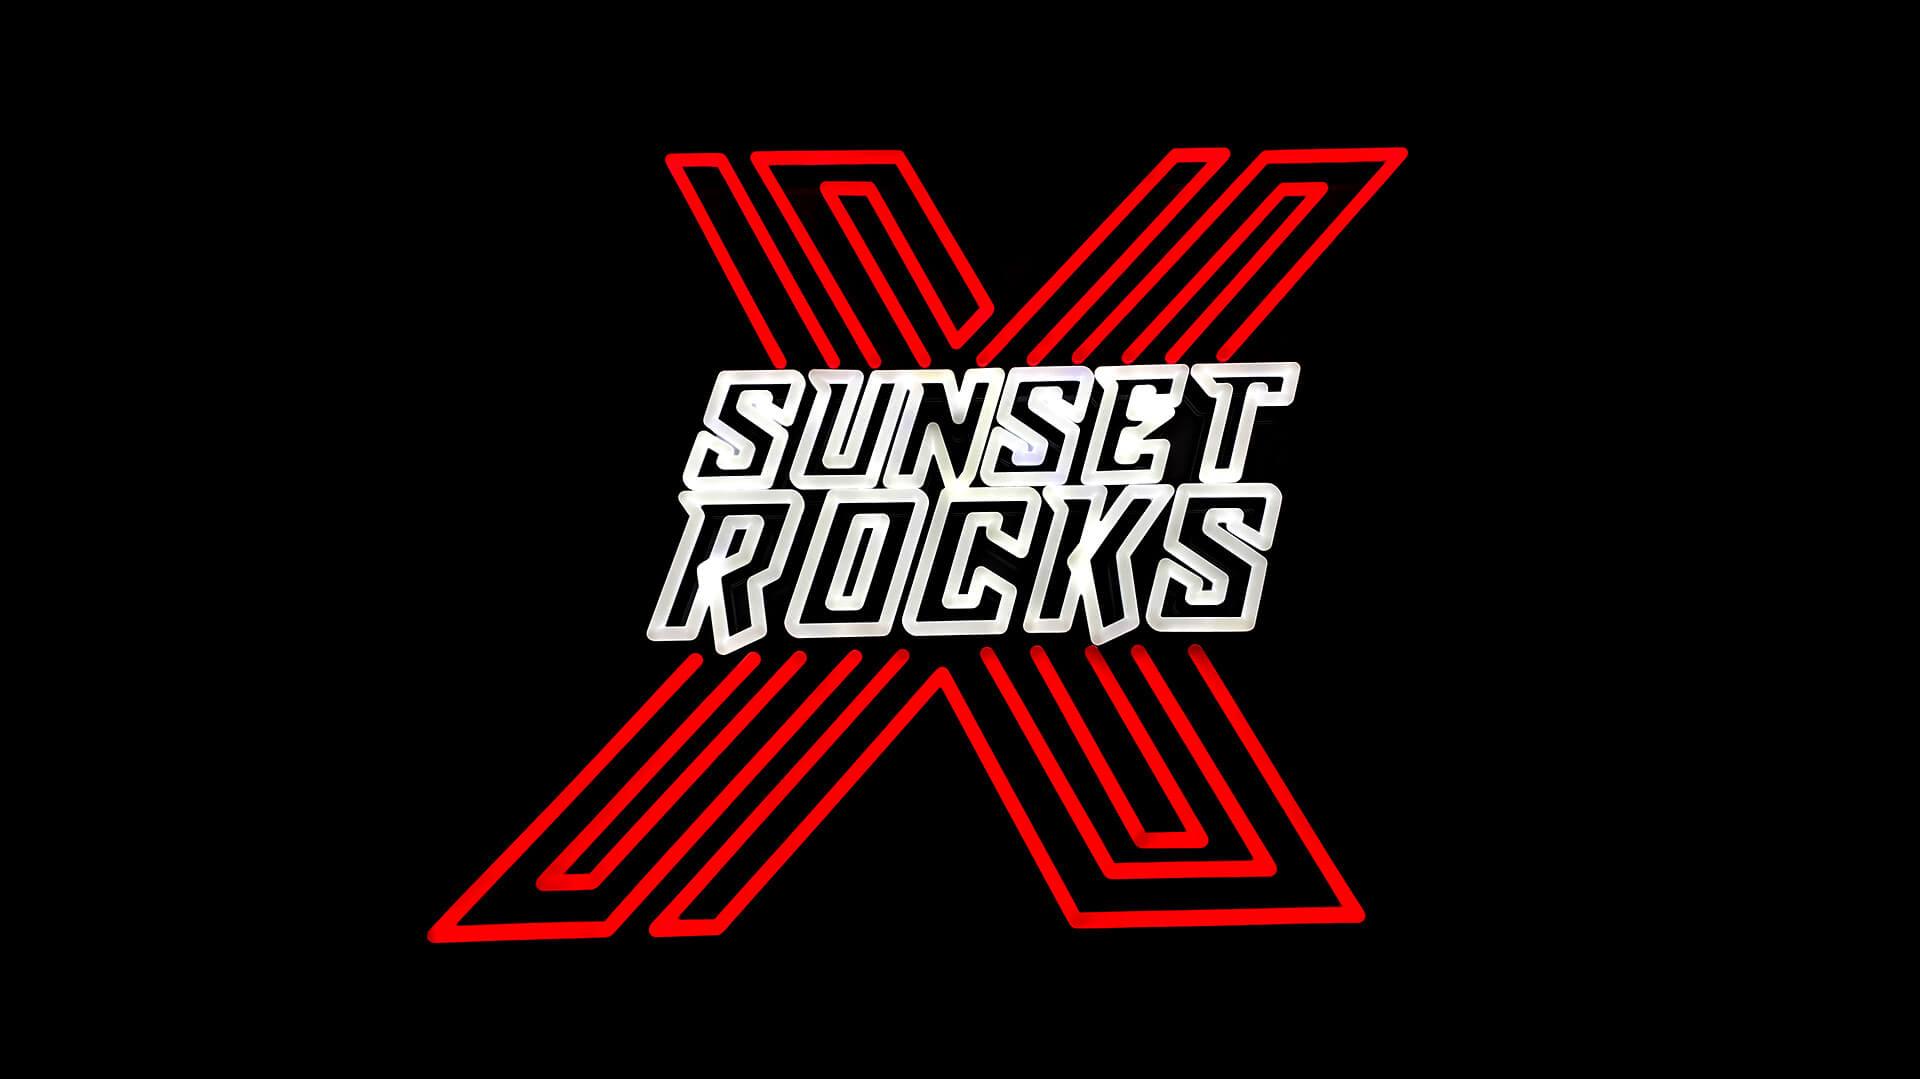 Beautiful SUNSET Rocks corporate events neon sign